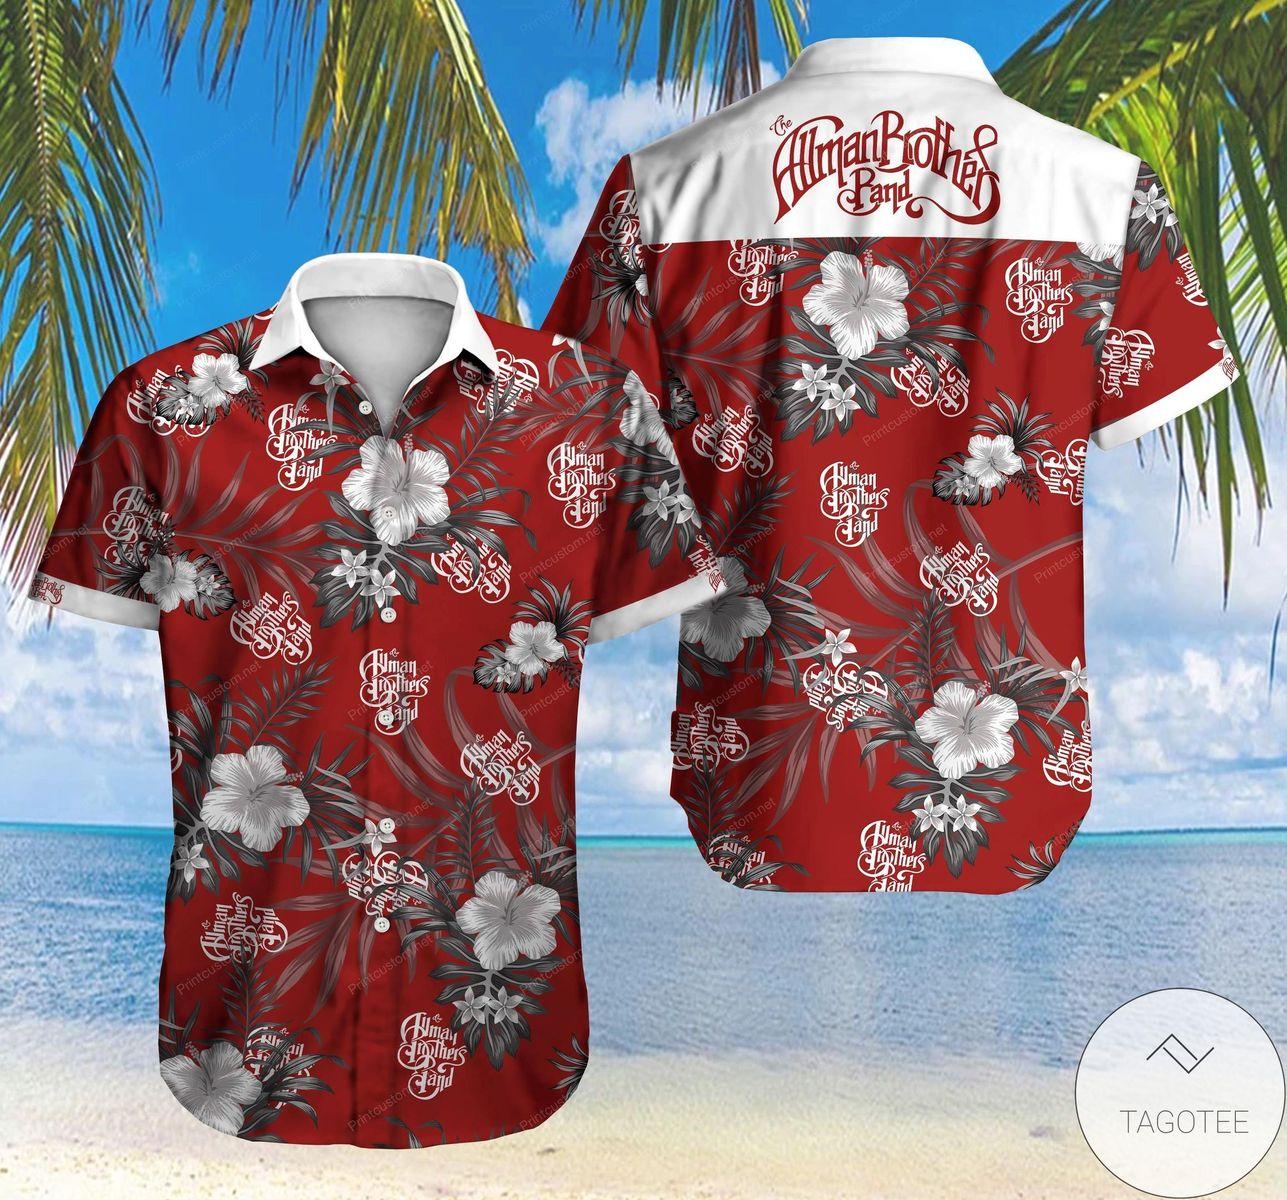 The Allman Brother Band Hawaiian Shirt